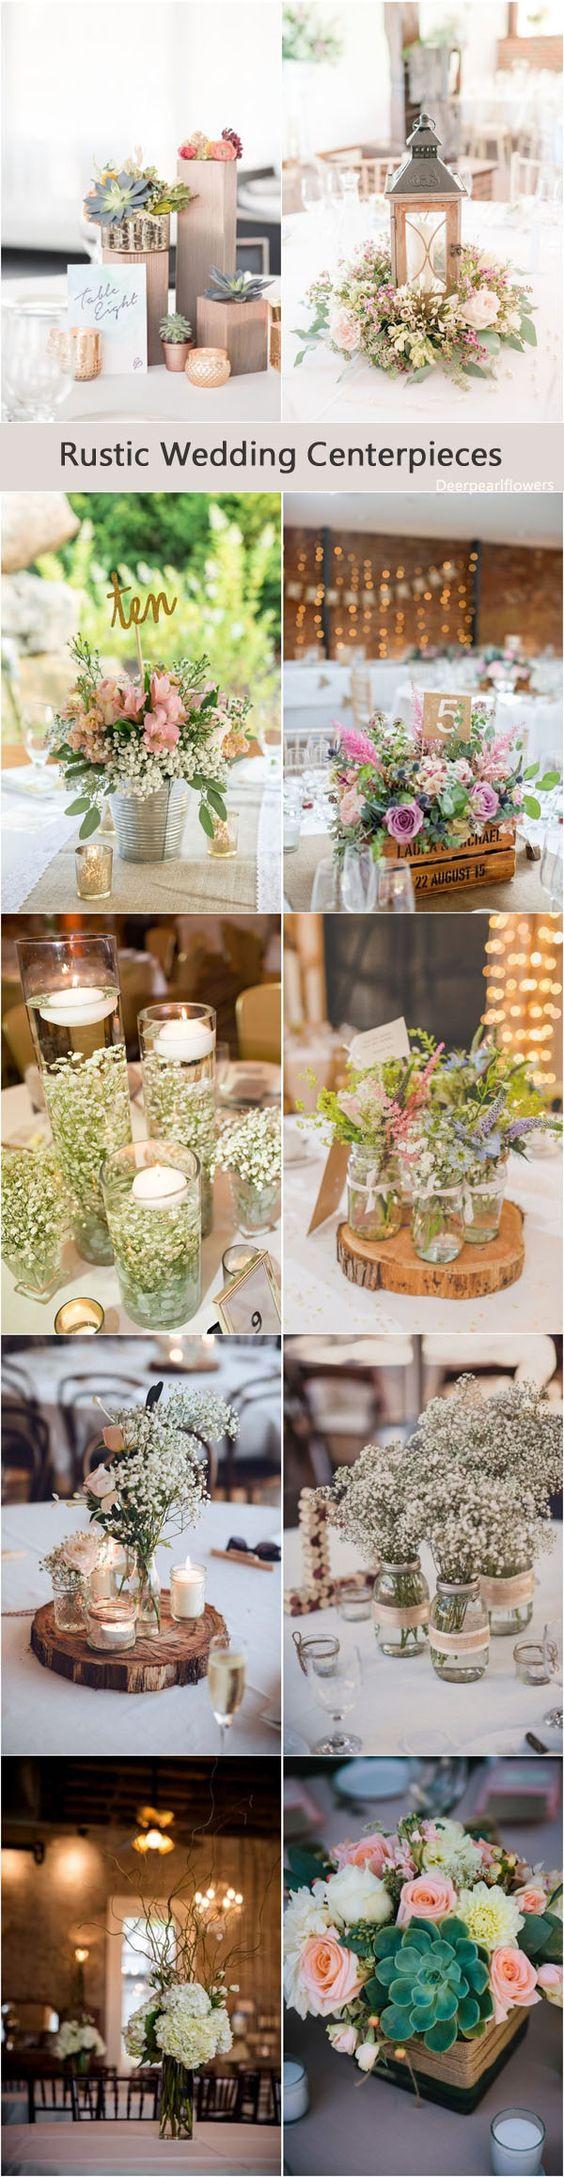 Wedding trends - Rustic wedding centerpiece ideas / http://www.deerpearlflowers.com/rustic-wedding-details-and-ideas/: